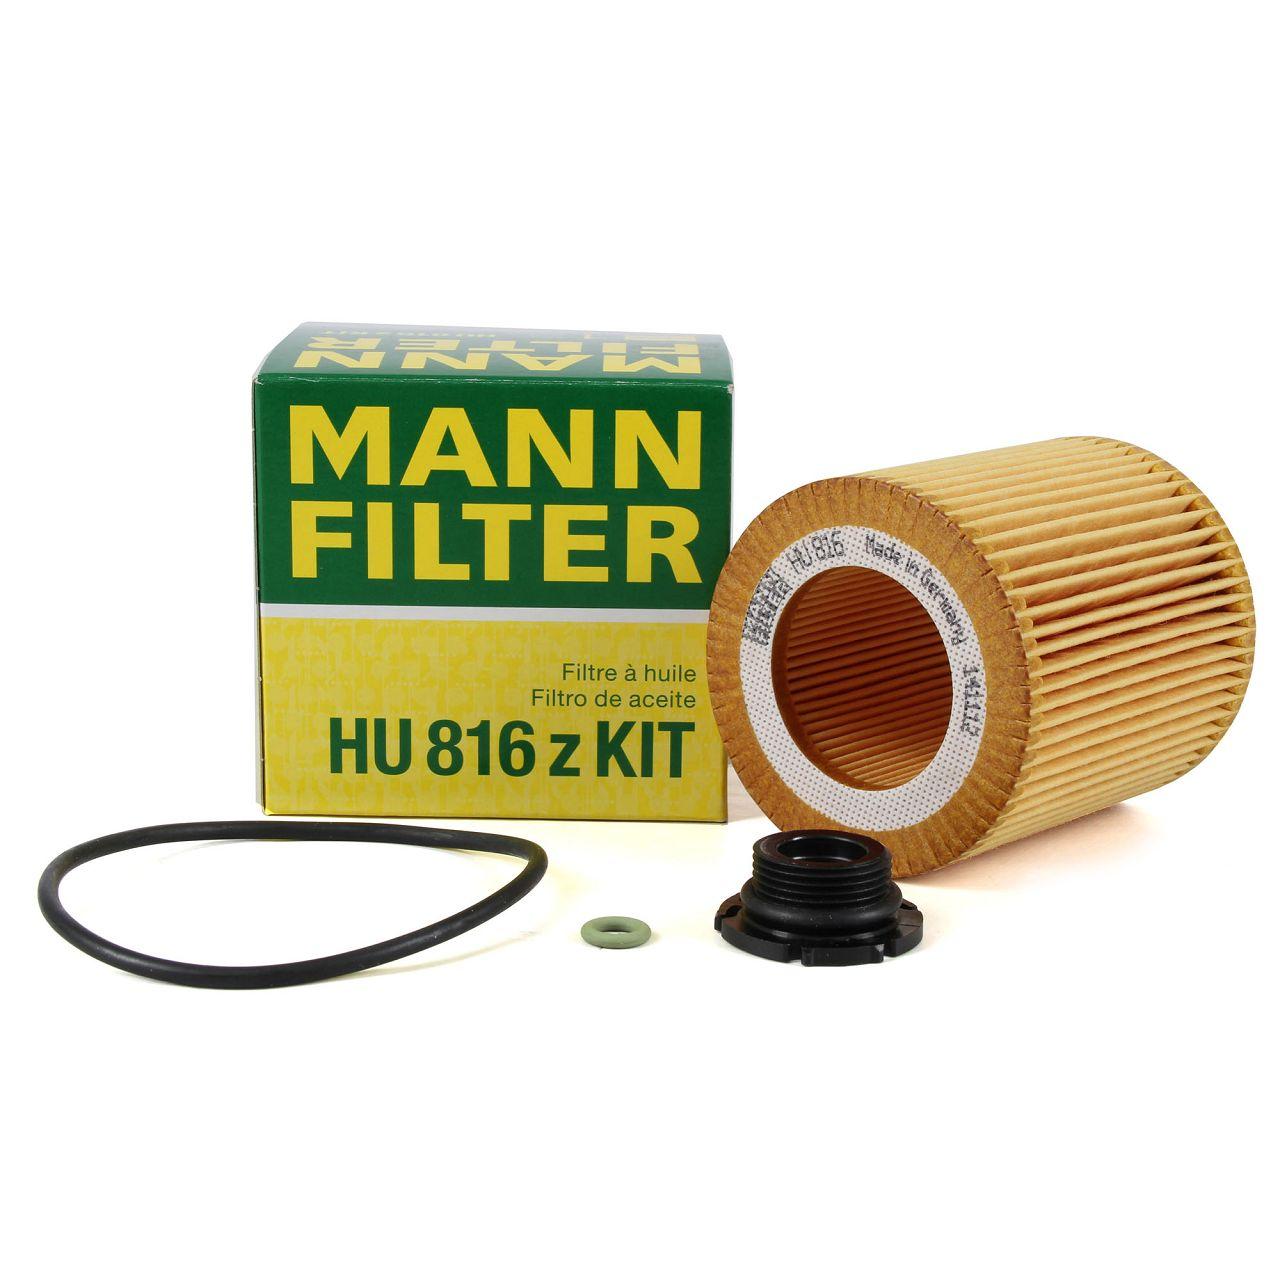 MANN HU816zKit Ölfilter BMW 3er F30 F31 F34 320/328i 5er F10 F11 520i 1er 125i